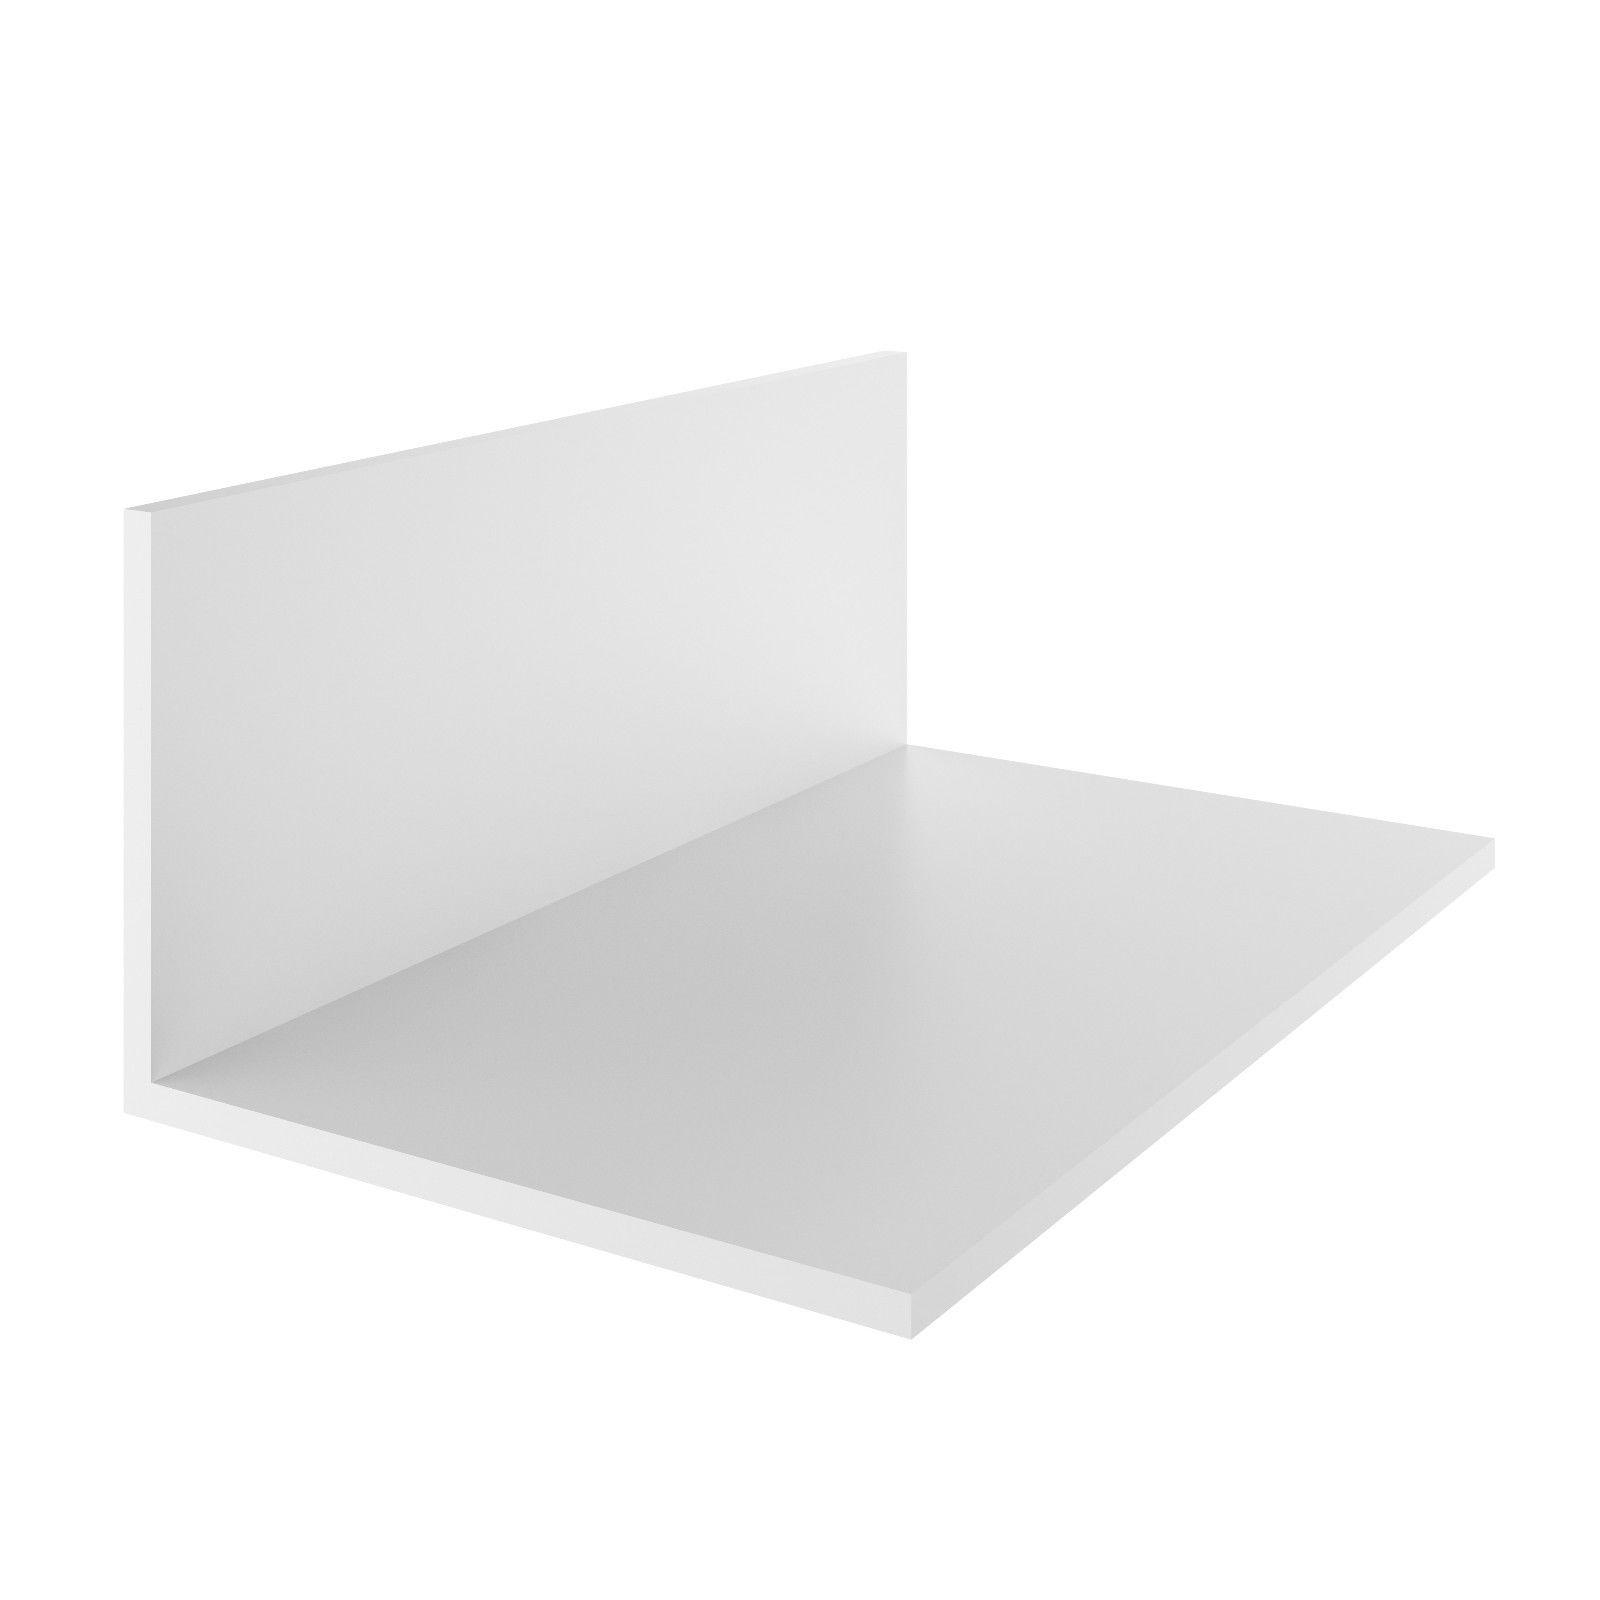 """1,93€/m"" 1,5m Profil Eckleiste Aussenwinkel PVC-Winkel Winkelprofil    25x25 mm"